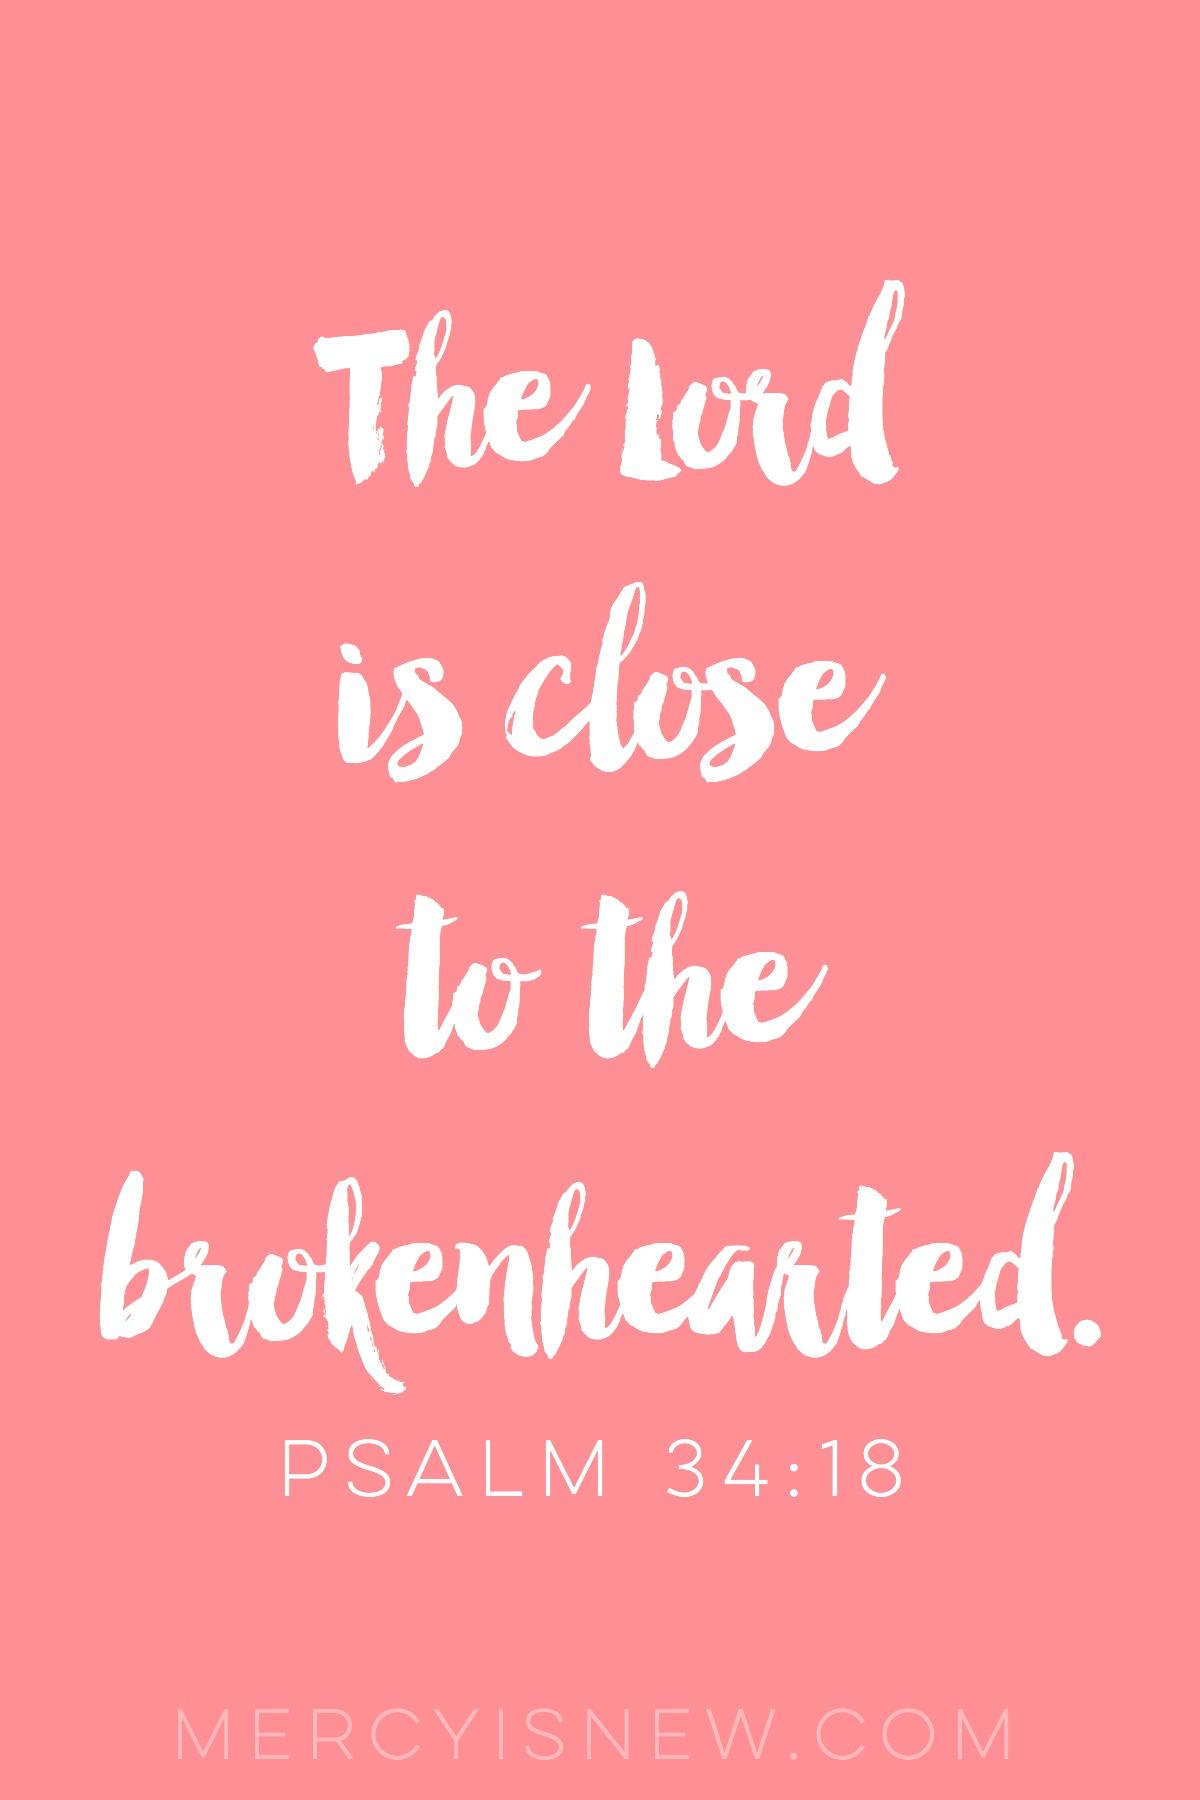 Scriptures-for-the-Brokenhearted-MercyIsNew.com_2.jpg